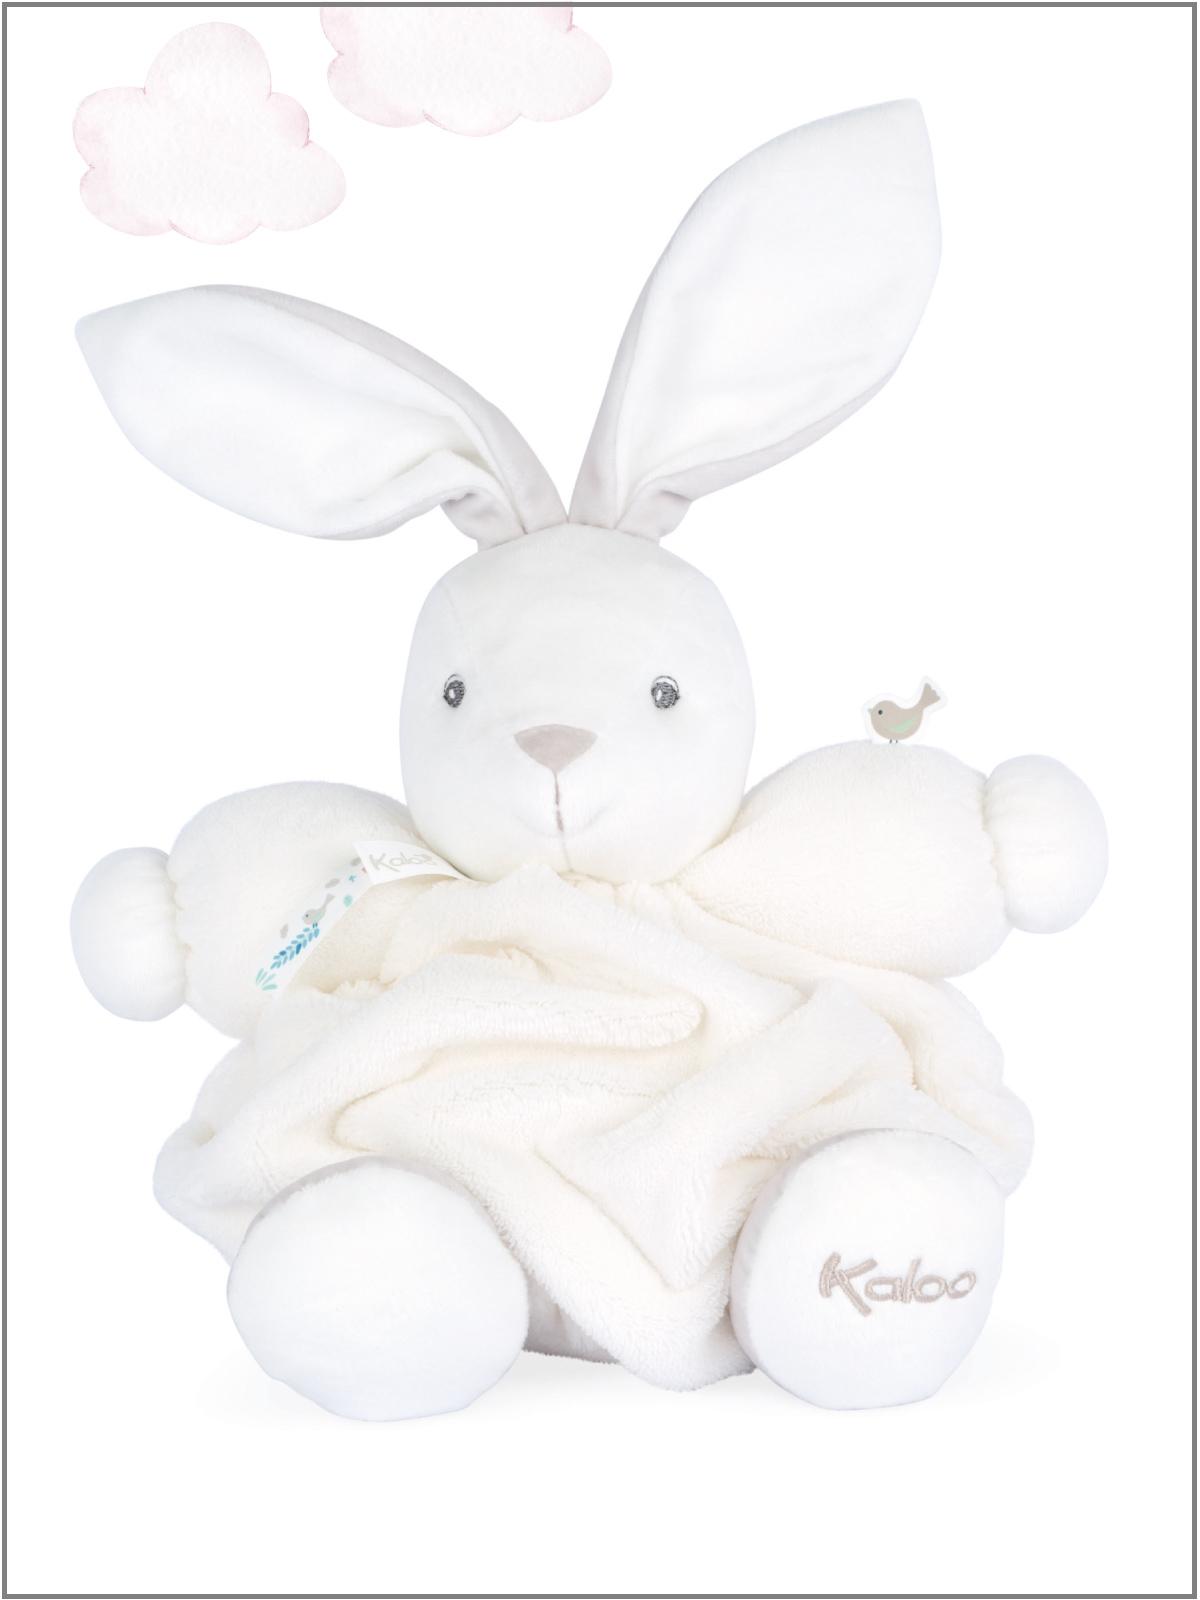 frederickandsophie-kids-toys-kaloo-france-soft-plush-rabbit-baby